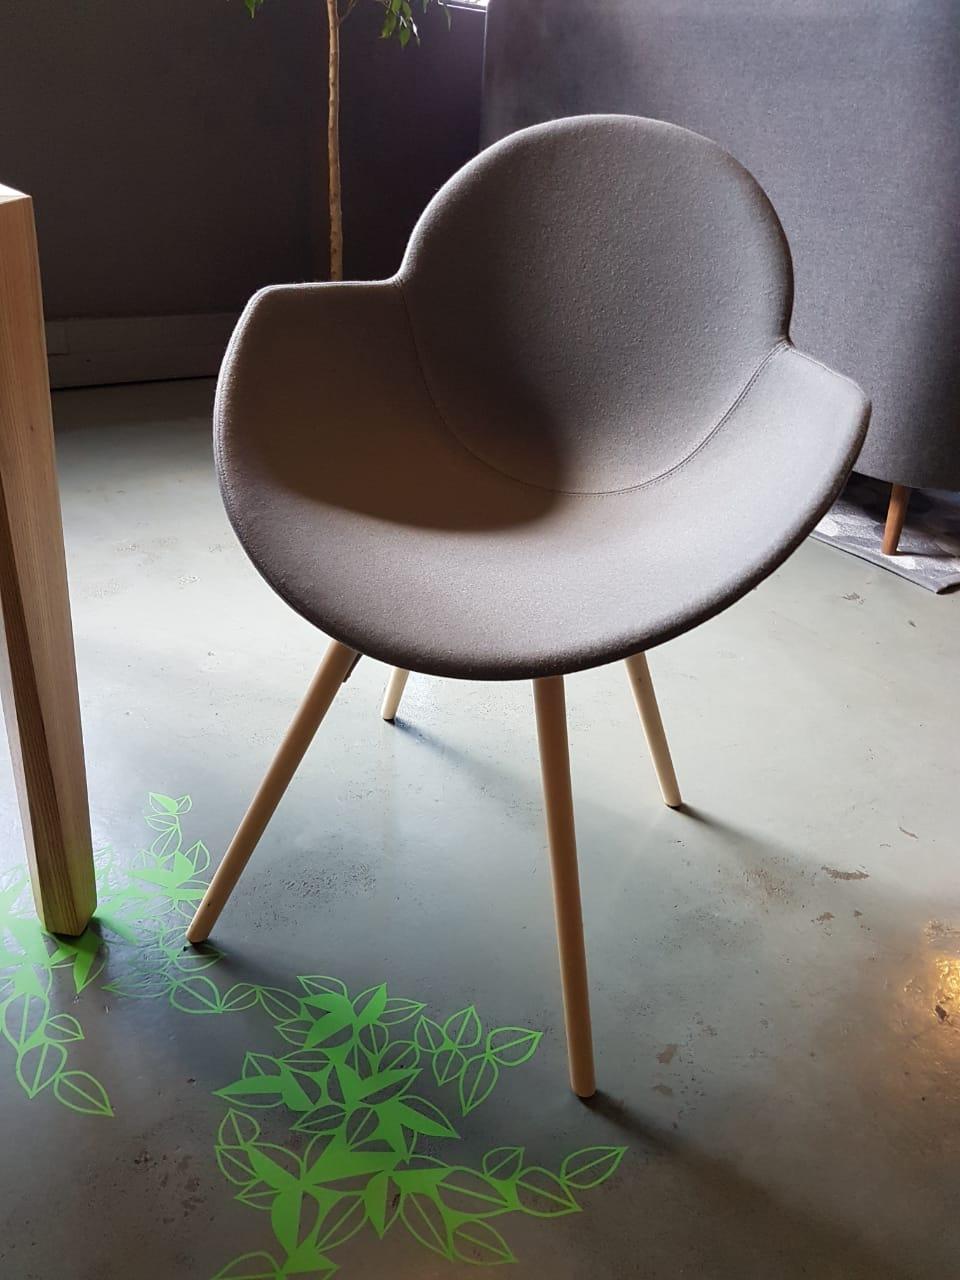 chair by INFINITI   BELOW  screening & lighitng by MOS